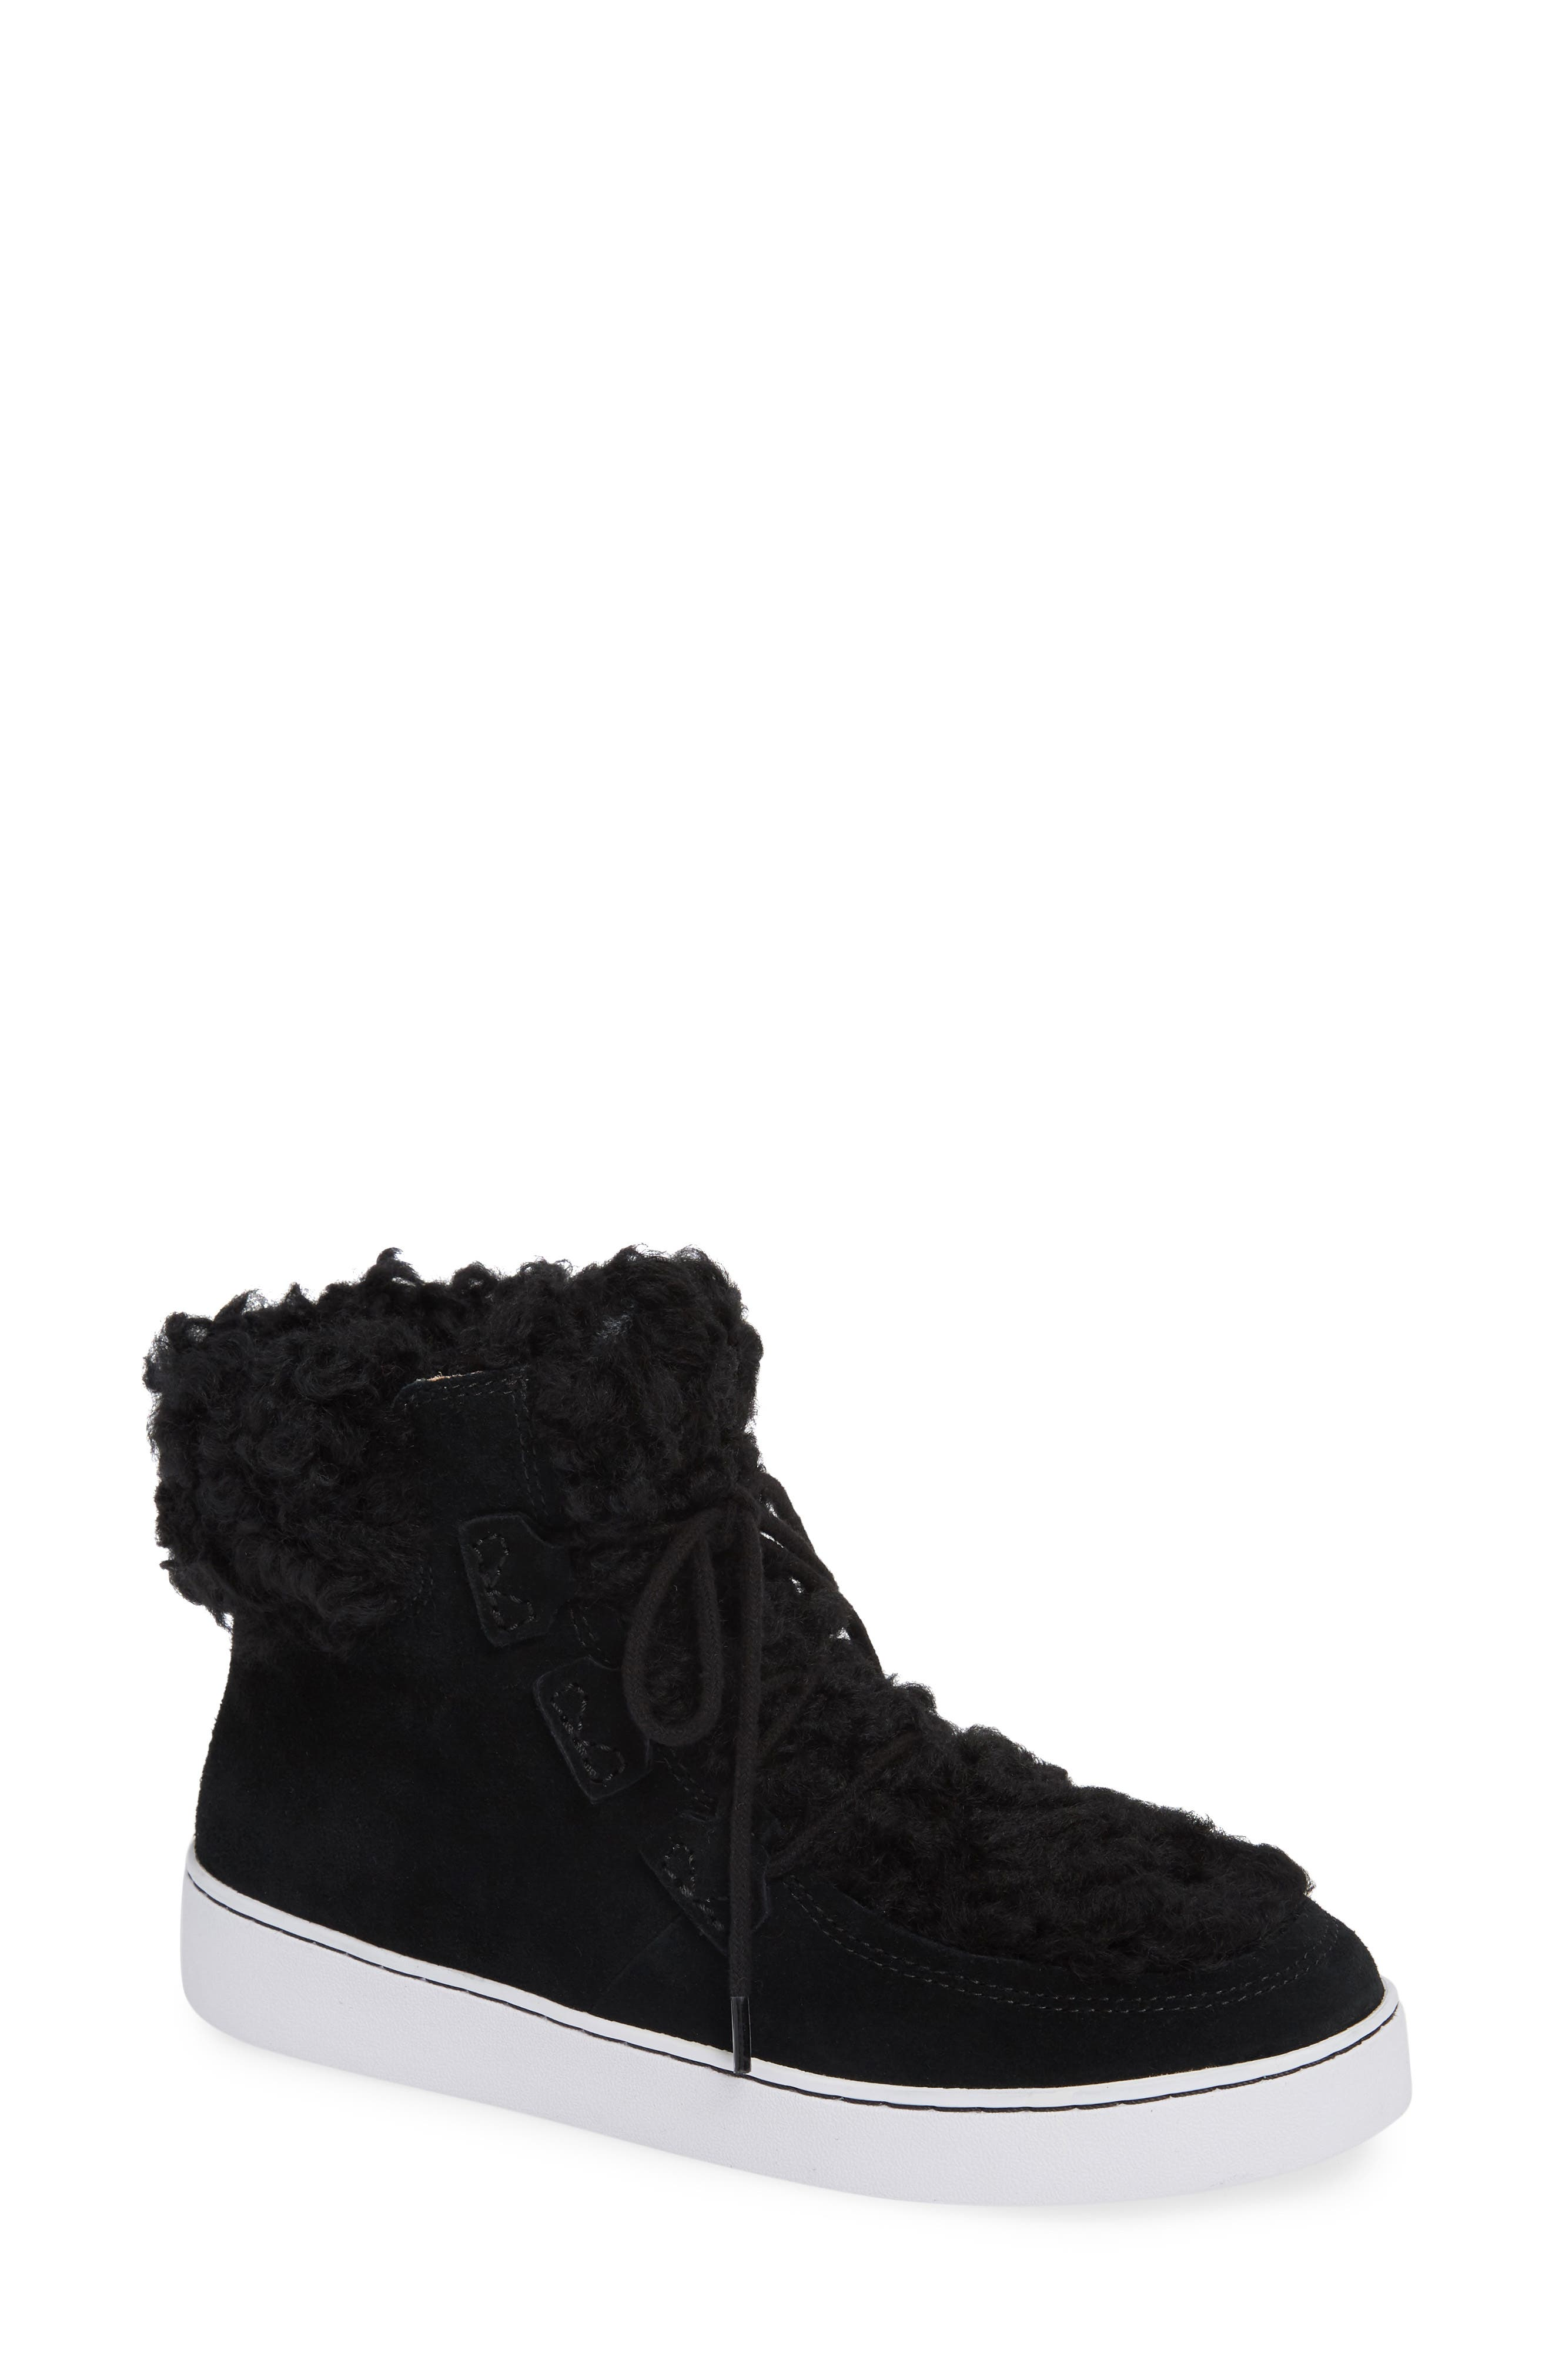 Oak Genuine Shearling Cuff Sneaker Bootie,                         Main,                         color, BLACK SUEDE